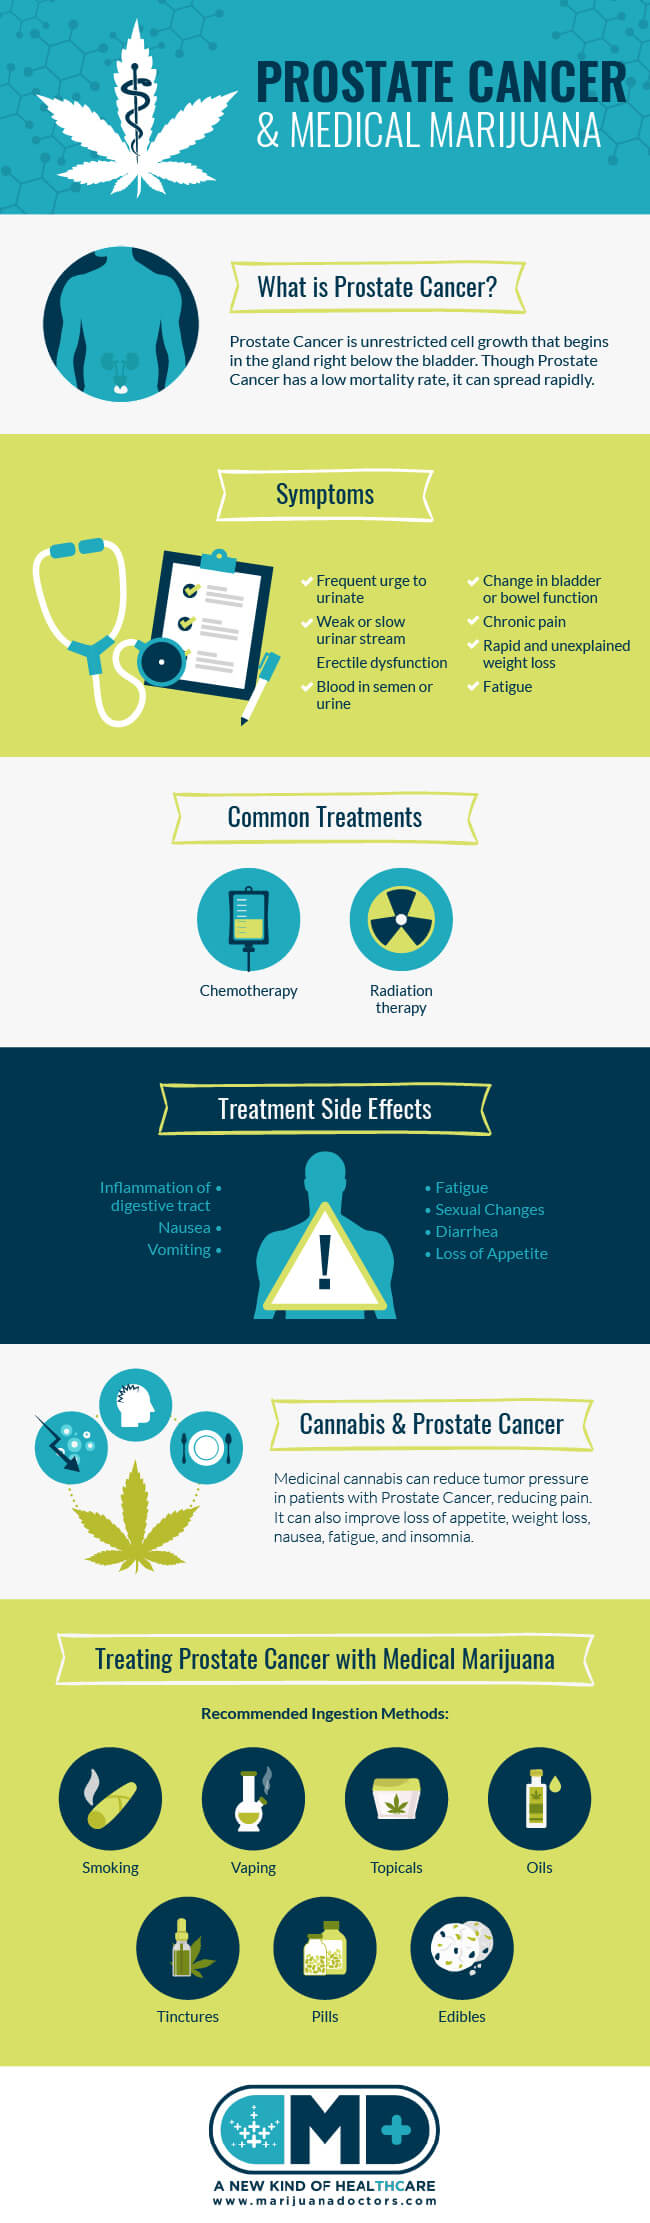 Medical Marijuana and Prostate Cancer